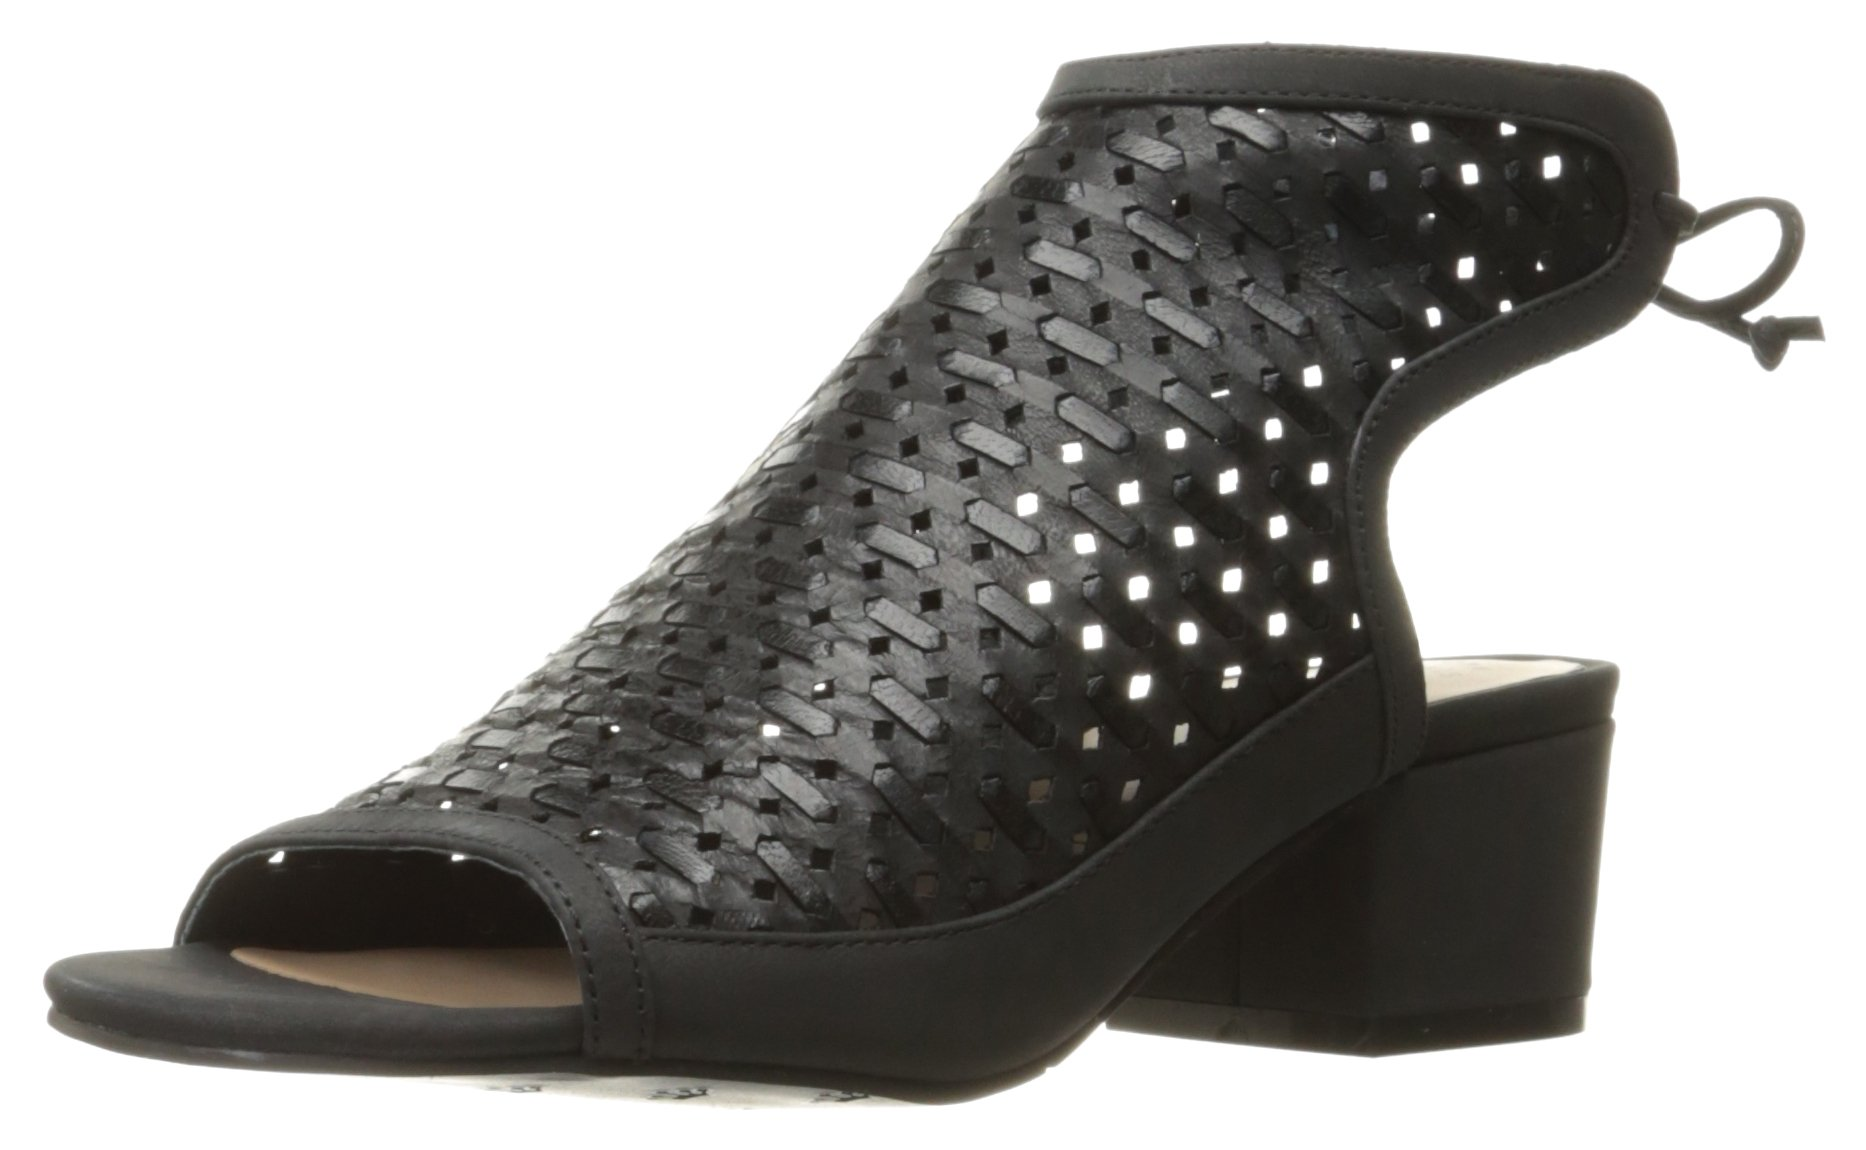 Nina Original Women's Vance Dress Sandal, Black, 9 M US